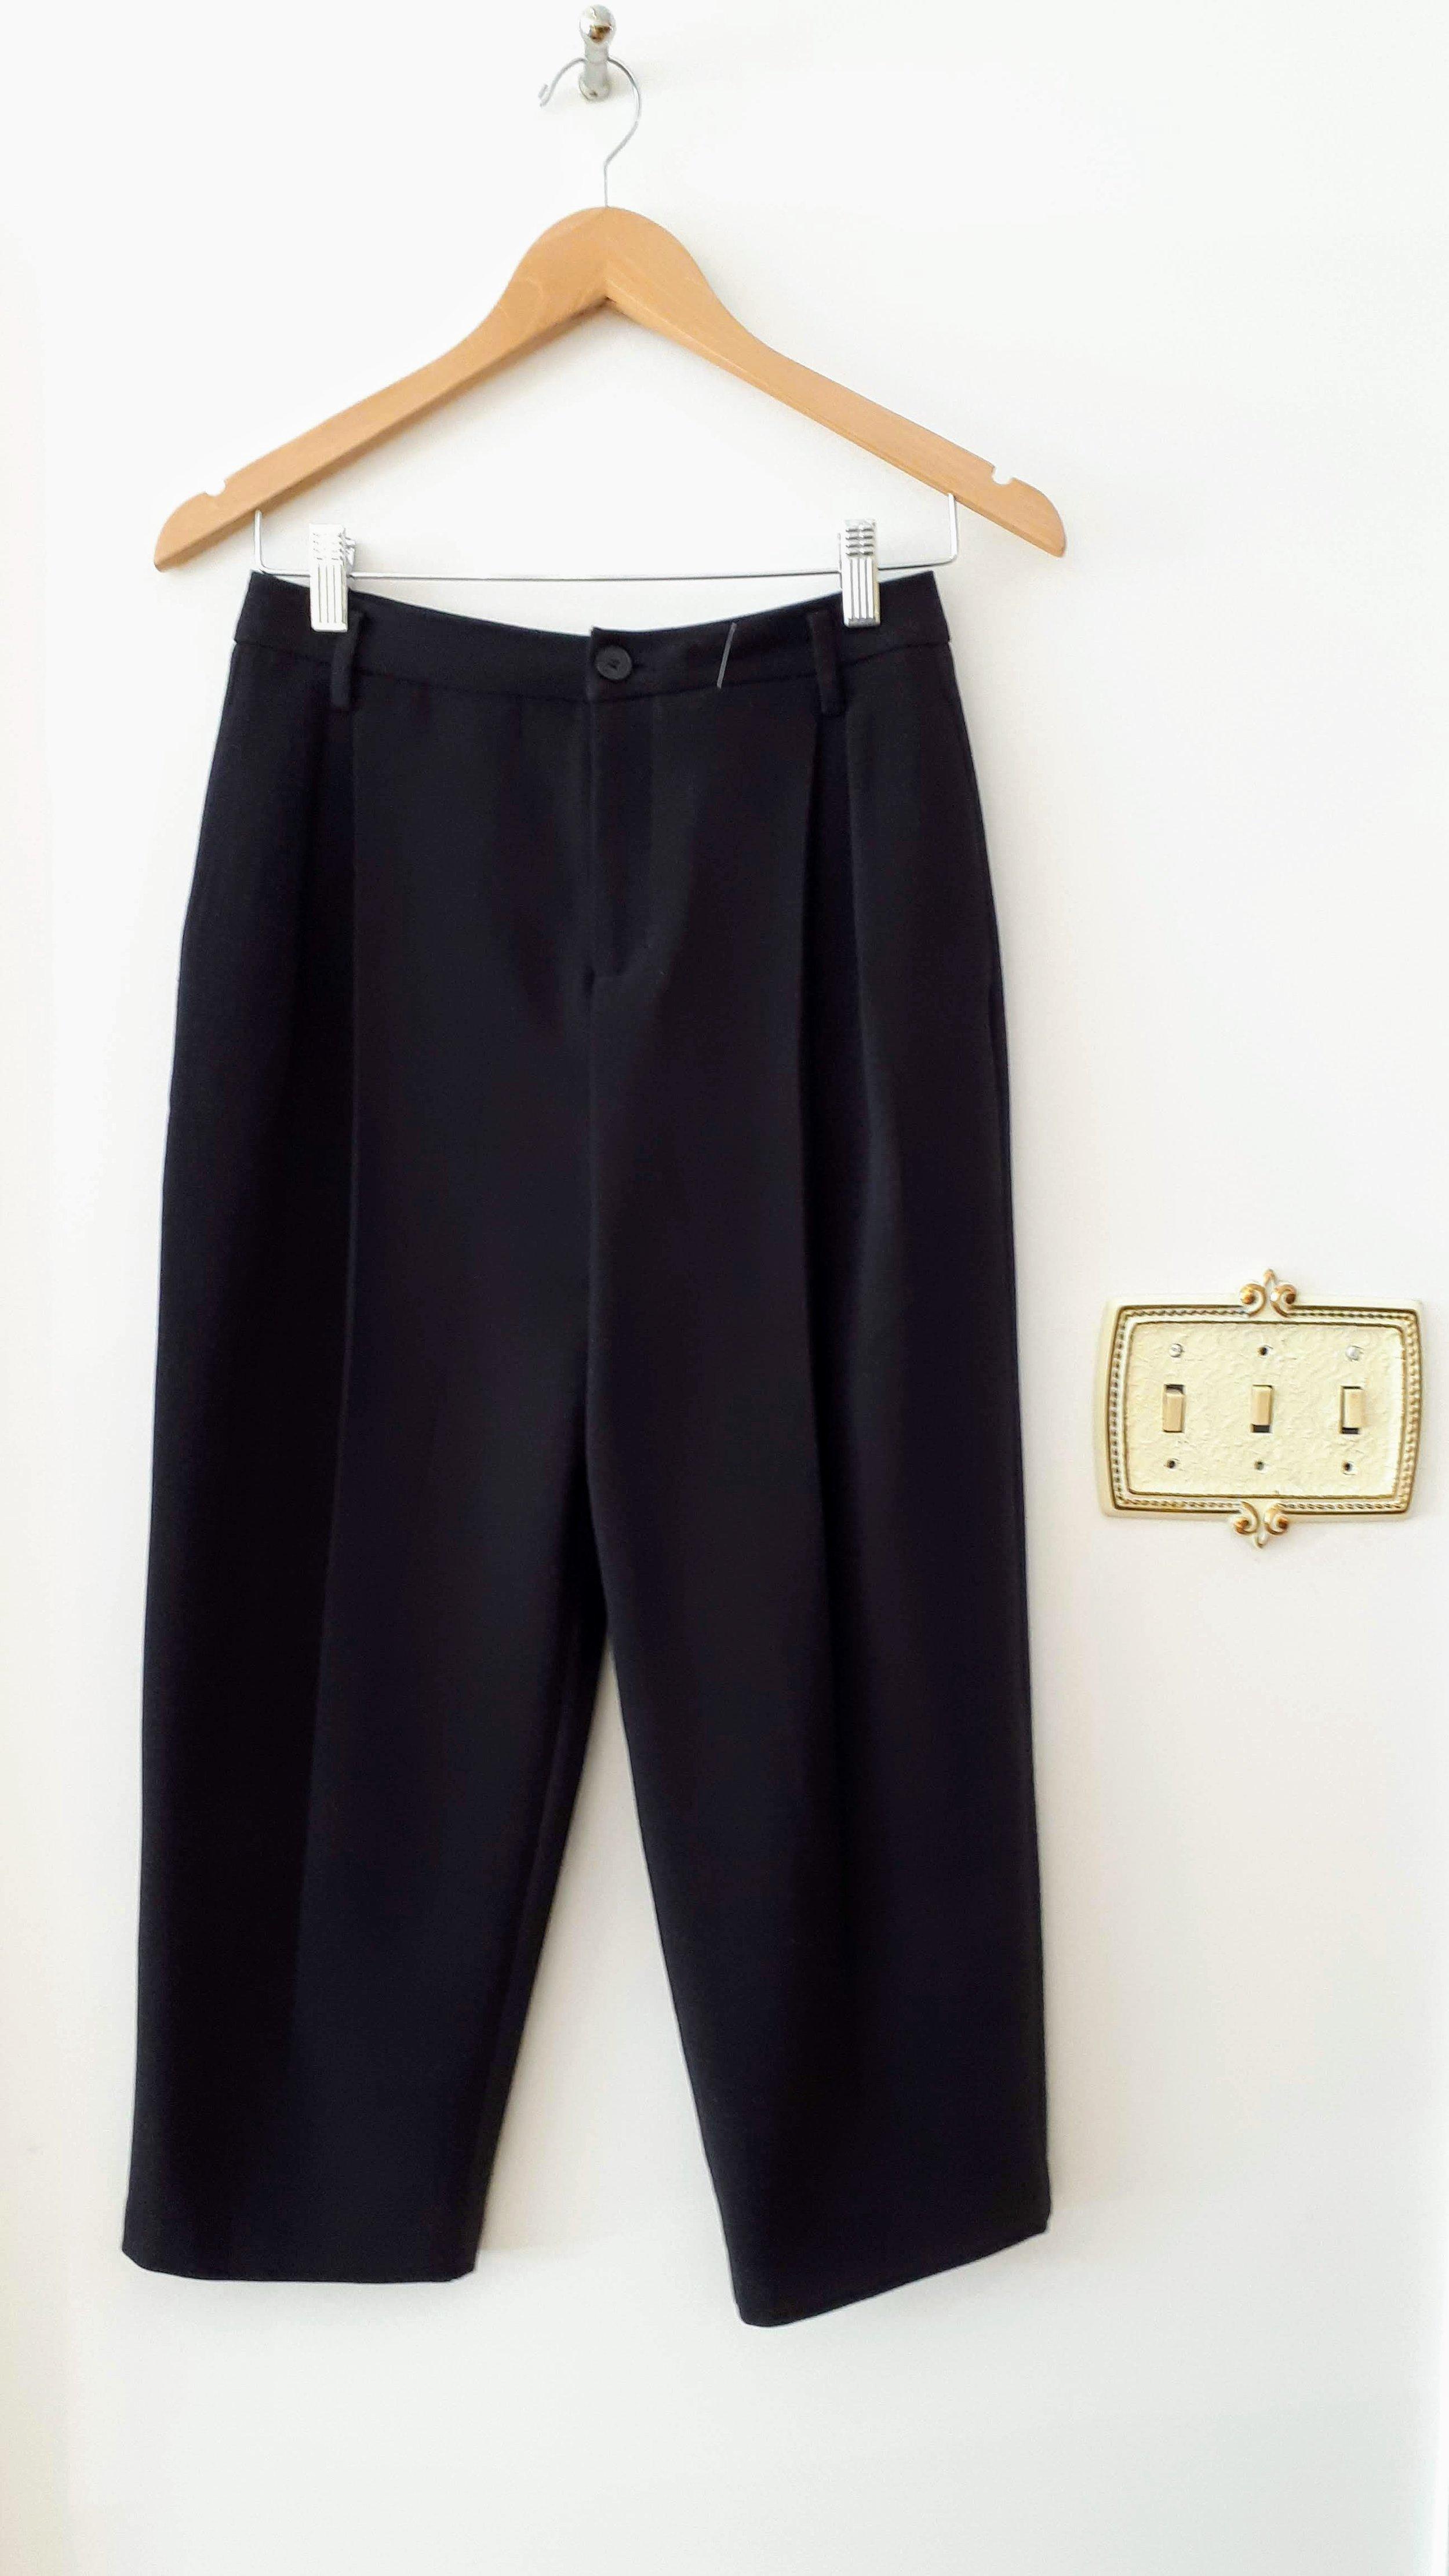 Oak + Fort pants; Size 2, $42